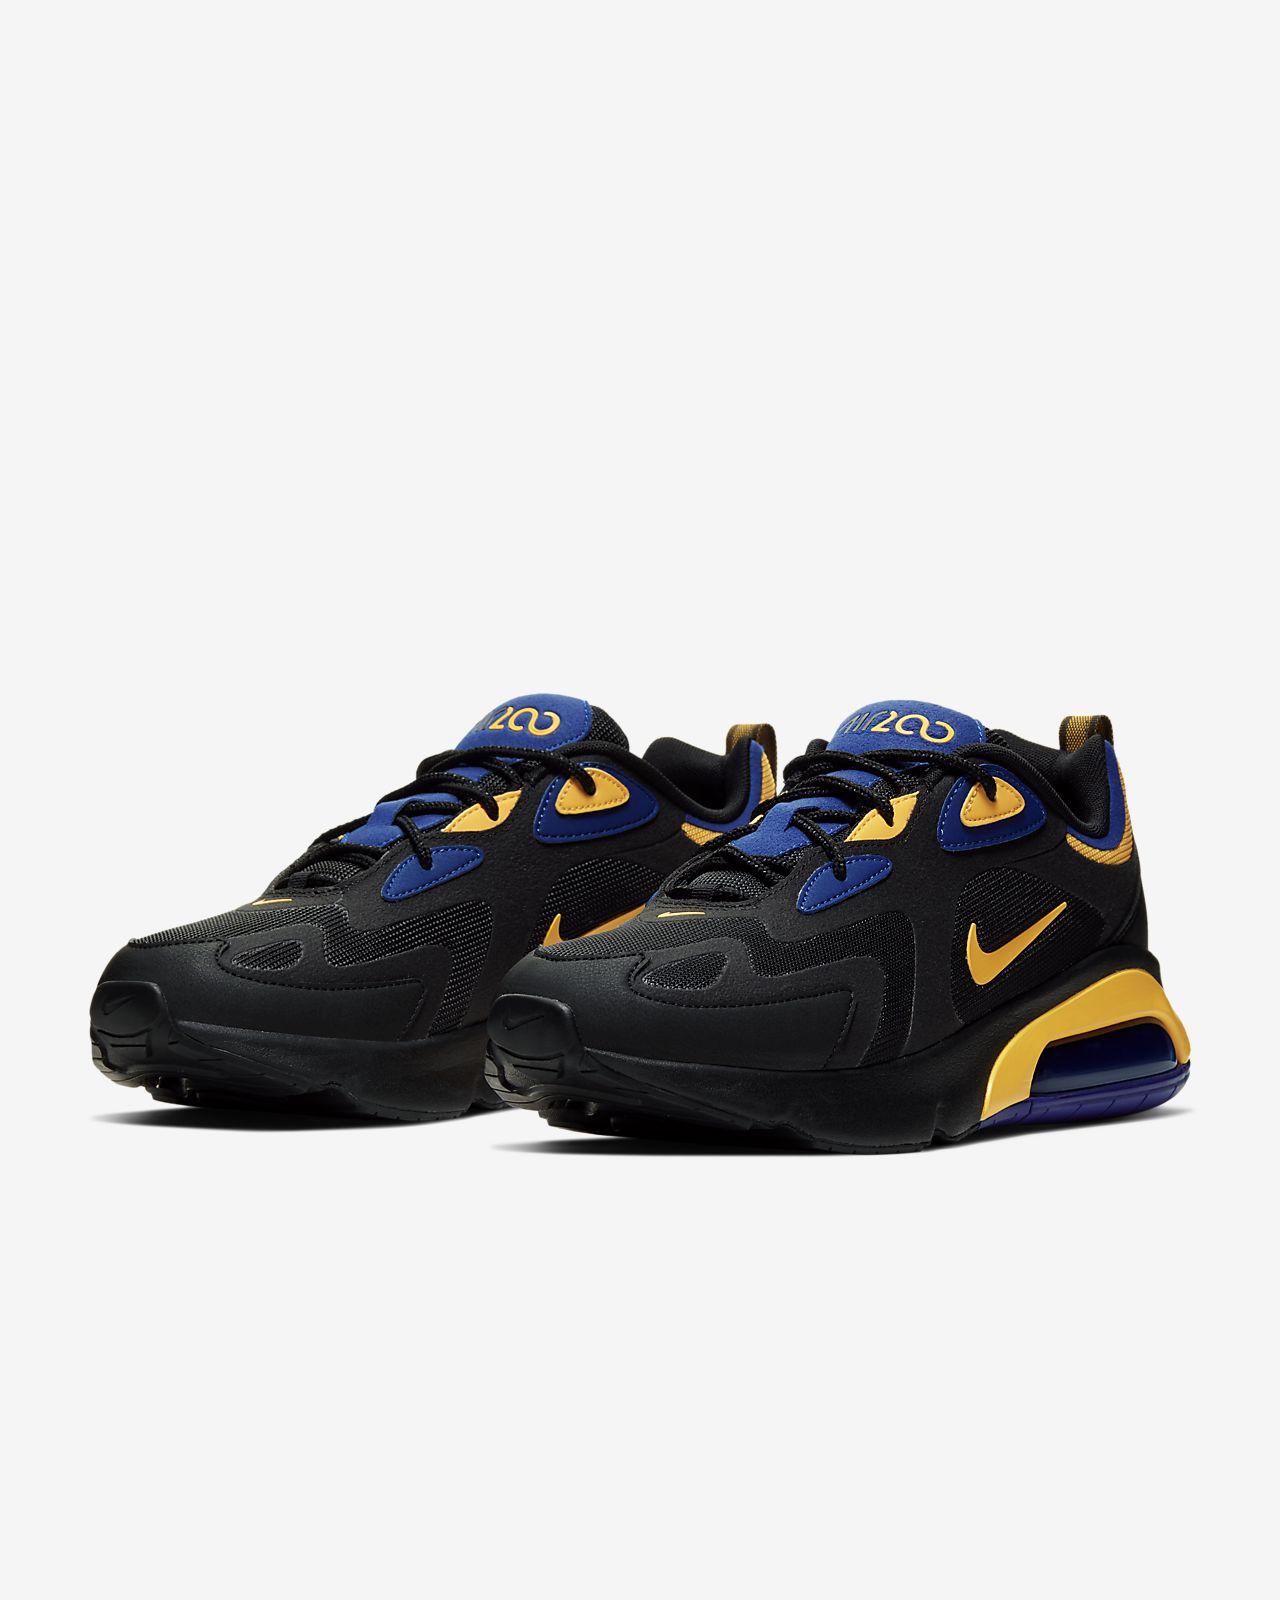 Nike Air Max 90 Denim Gold resolution